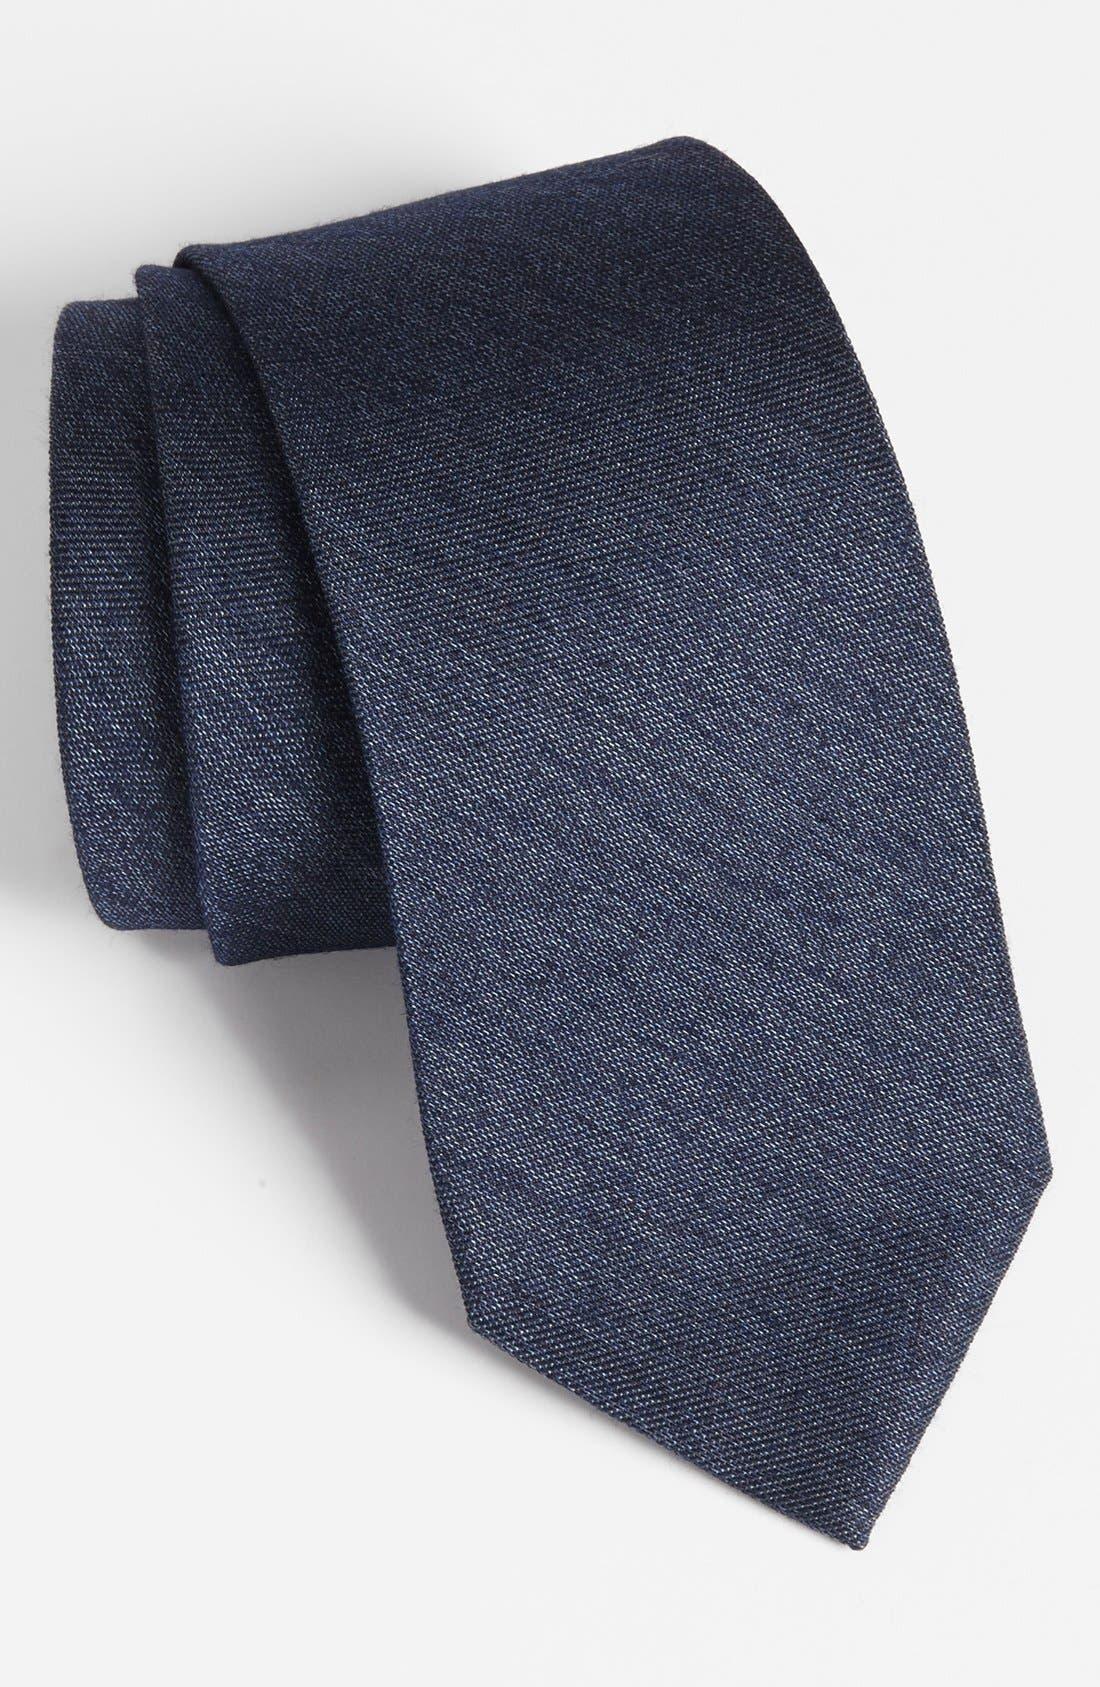 Alternate Image 1 Selected - Z Zegna Woven Silk & Wool Tie